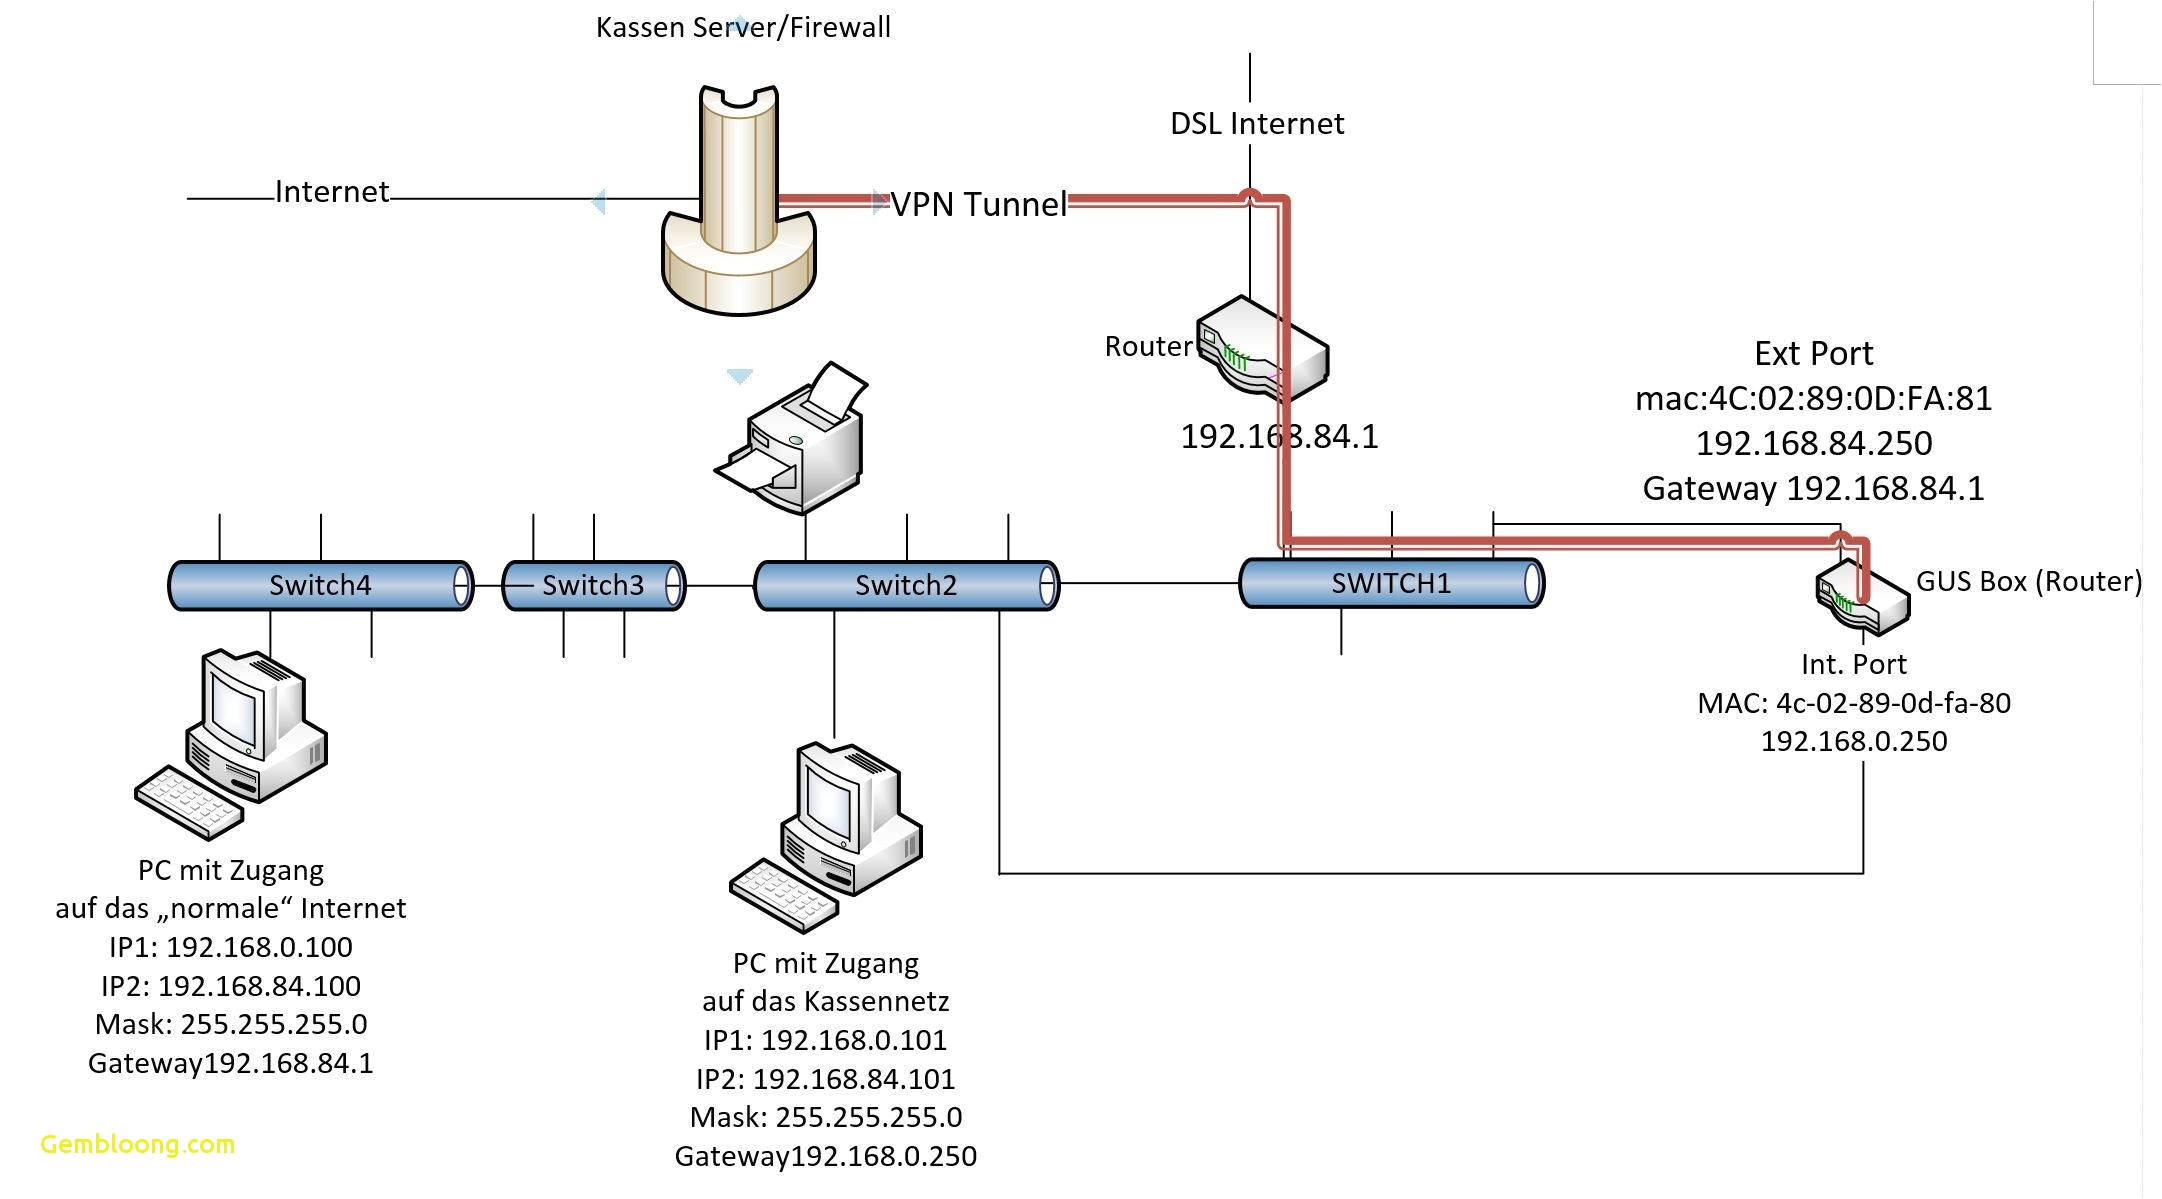 100 amp electrical panel wiring diagram inspirational 100 amp electrical panel wiring diagram best wiring diagram